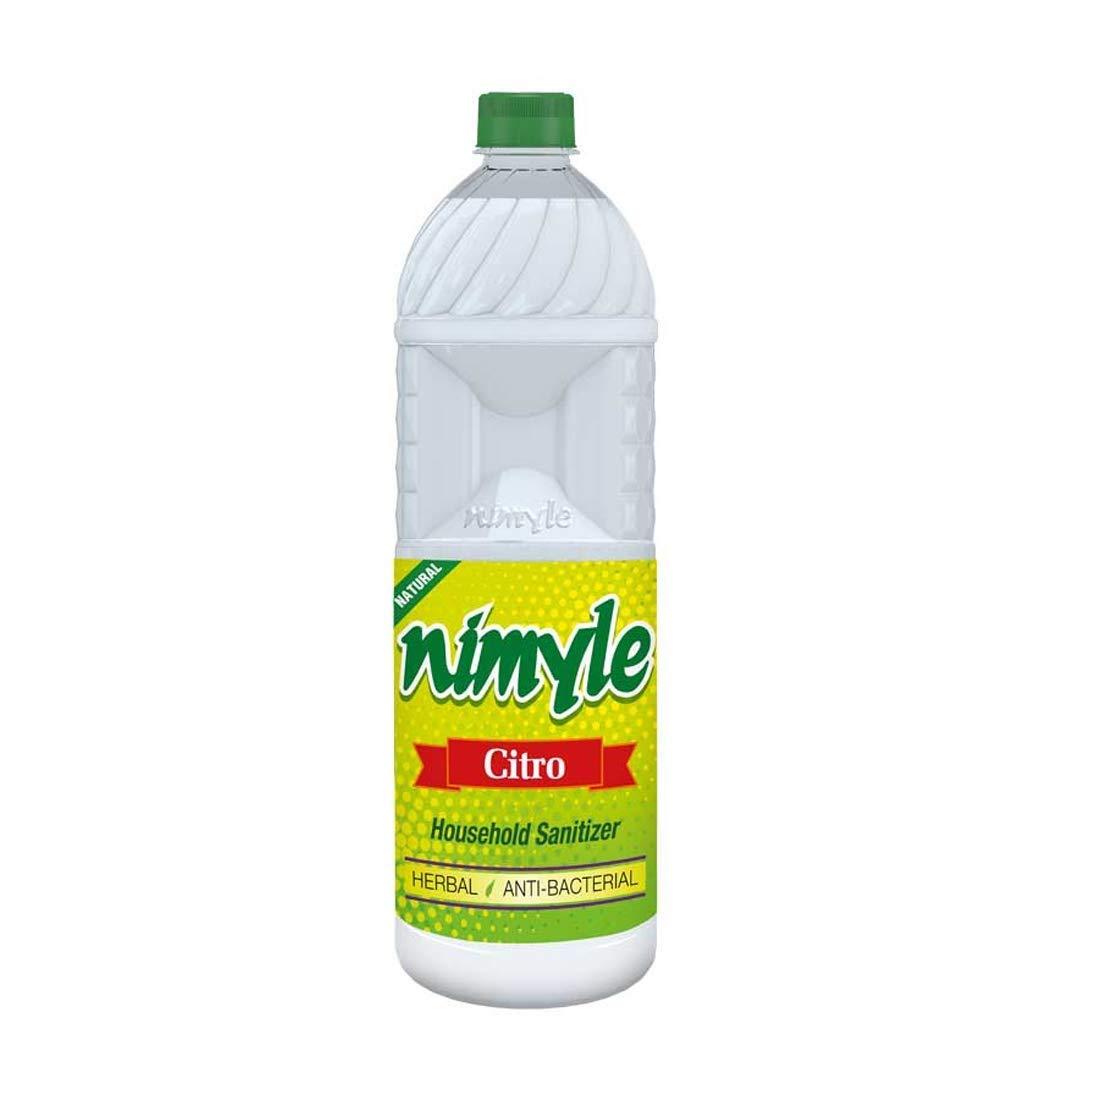 Nimyle Citro Household Sanitizer By ITC.